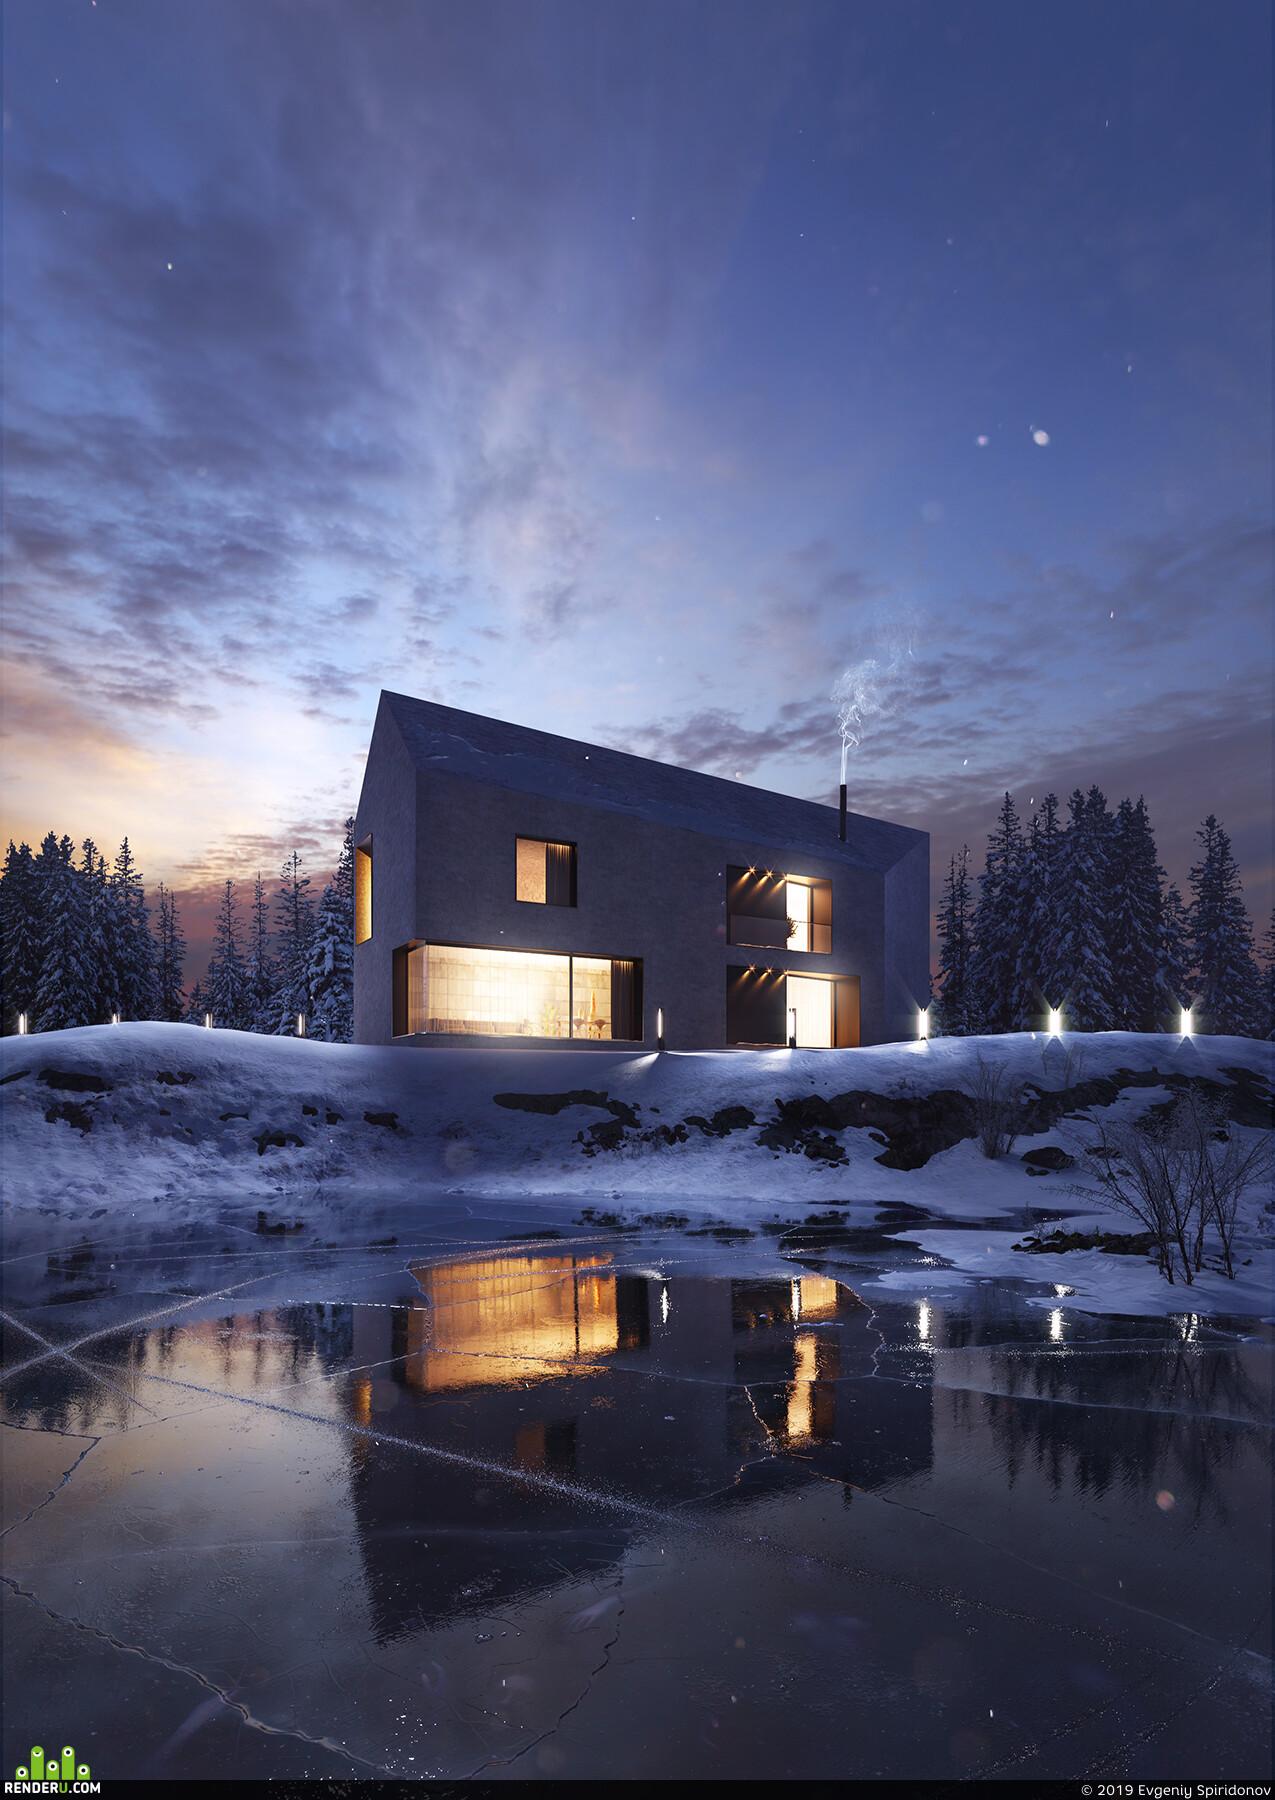 archviz, Exterior architecture, architectural render, arhiarchitecture